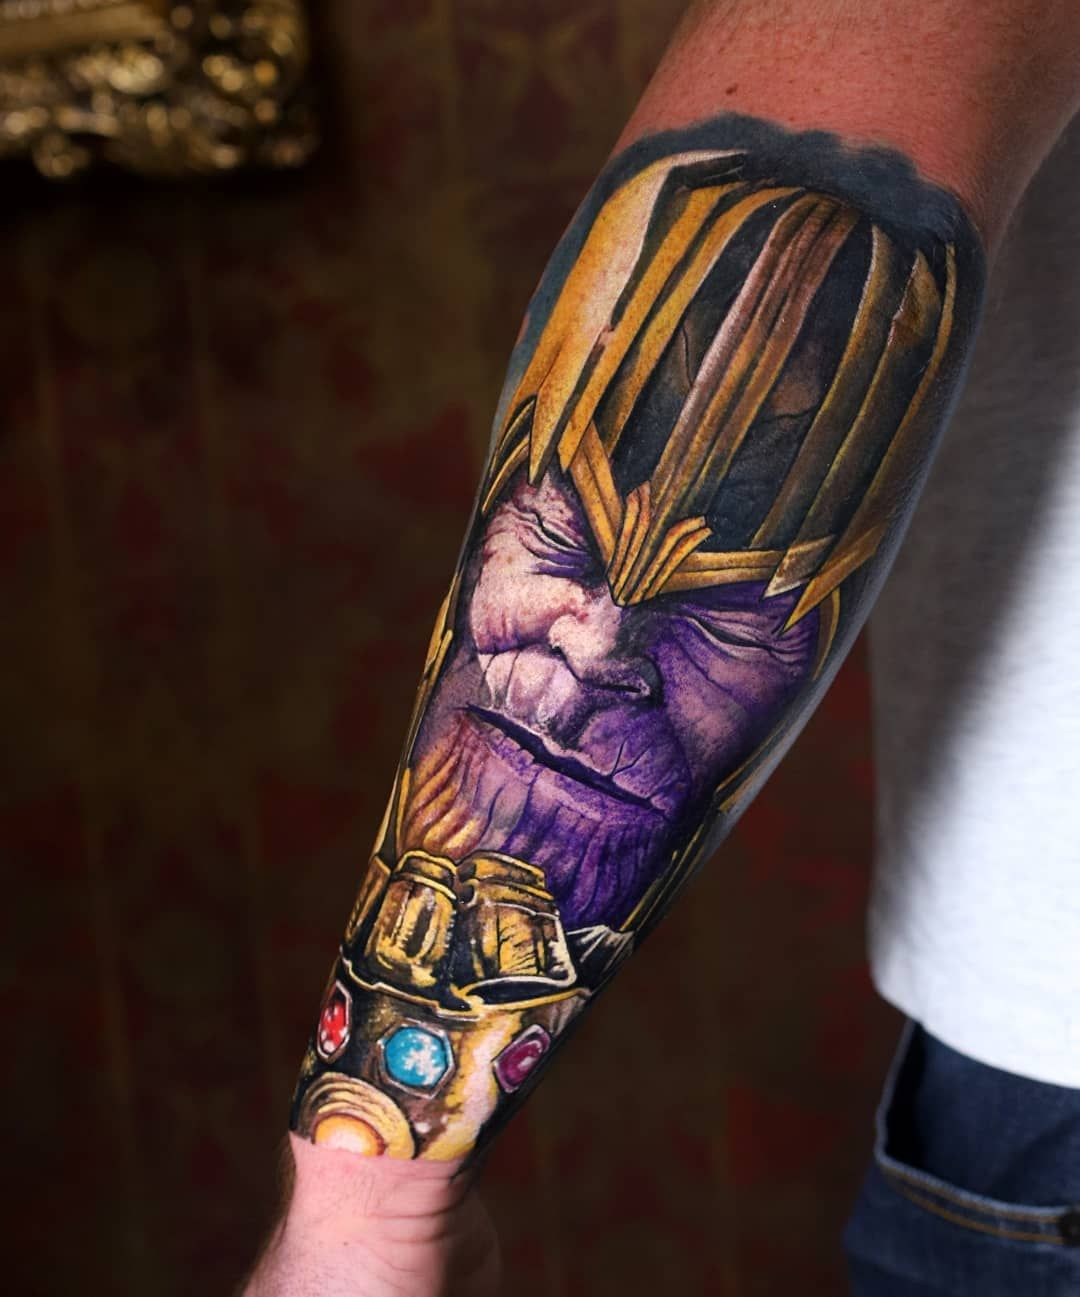 Tannos Tattoo